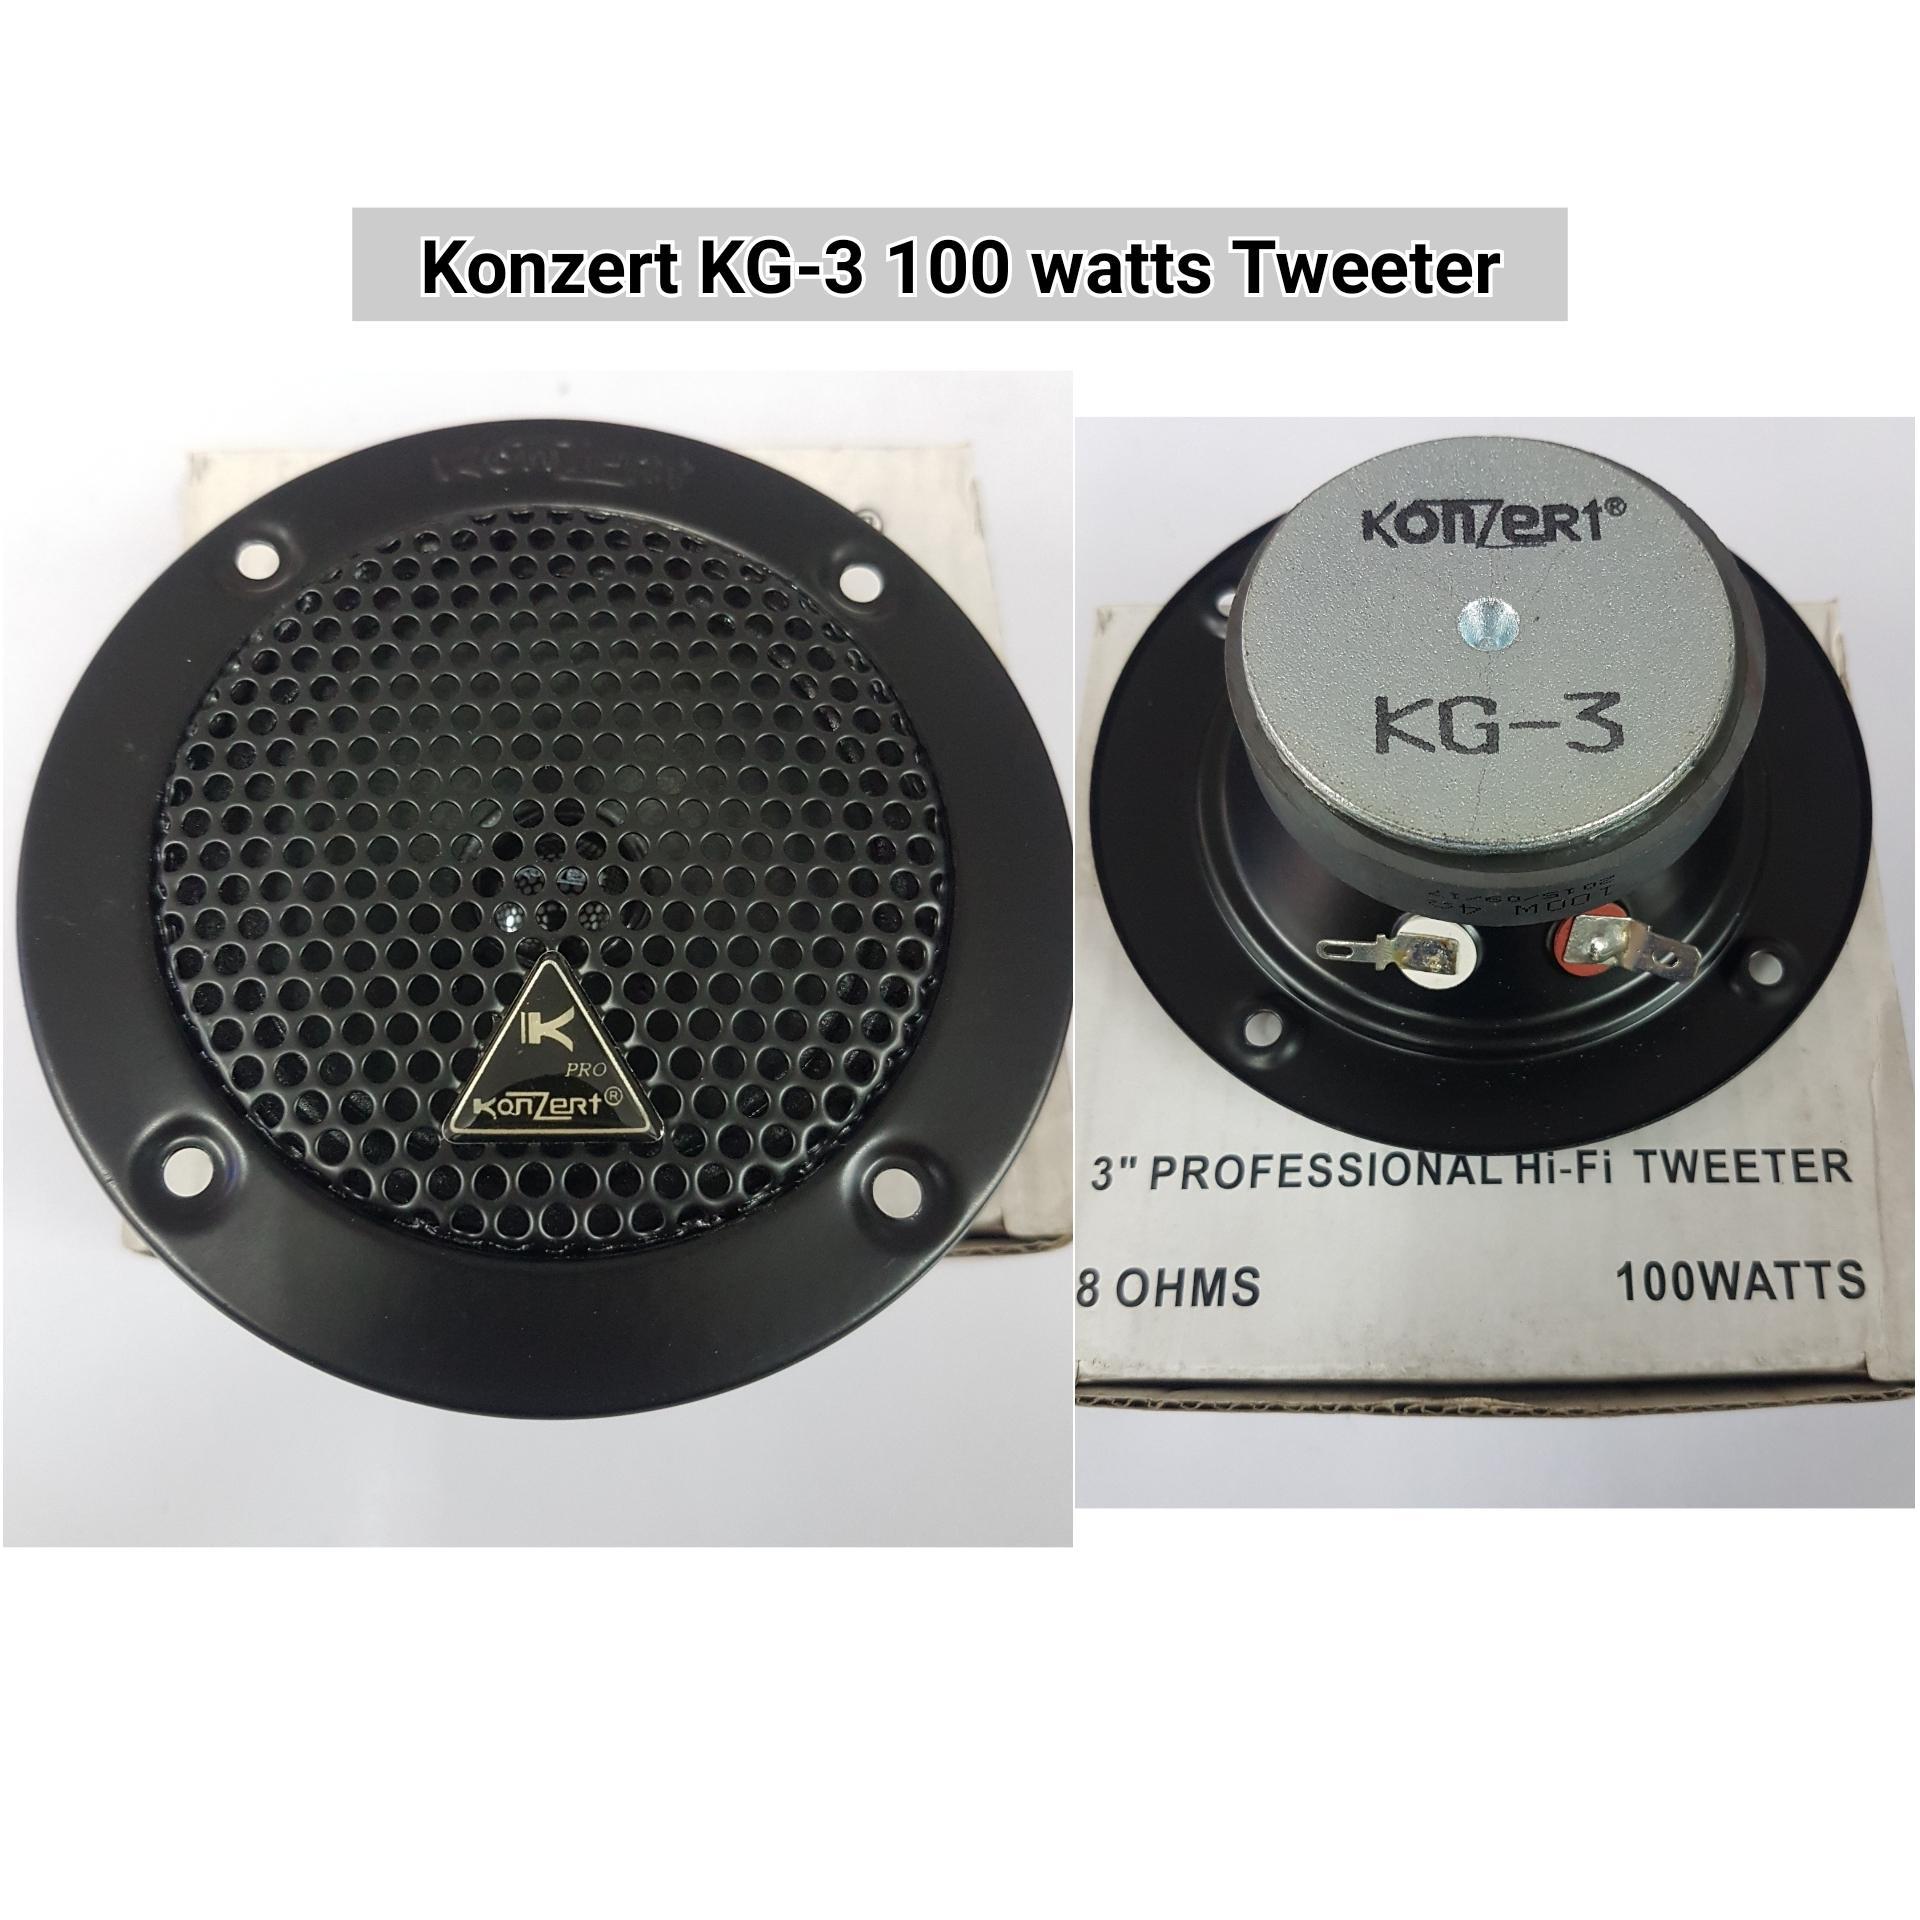 Konzert Philippines Price List Home Entertainment 8r 625w Loudspeaker Driven By Power Amplifier Live Sound Stage Accessories